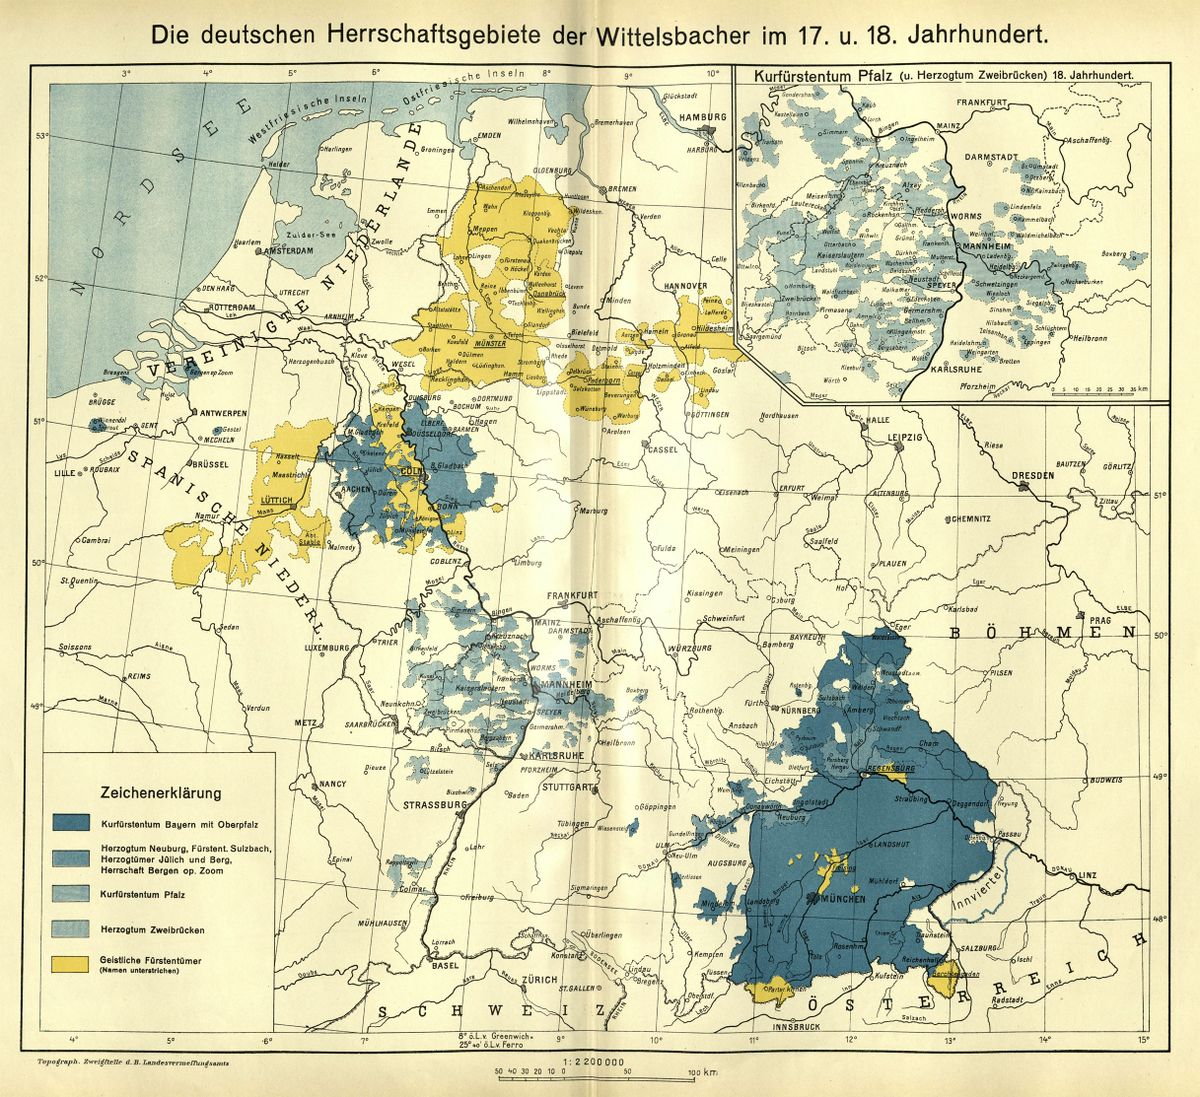 Deutsche Karte Vor Dem 1 Weltkrieg.Staatsgebiet 19 20 Jahrhundert Historisches Lexikon